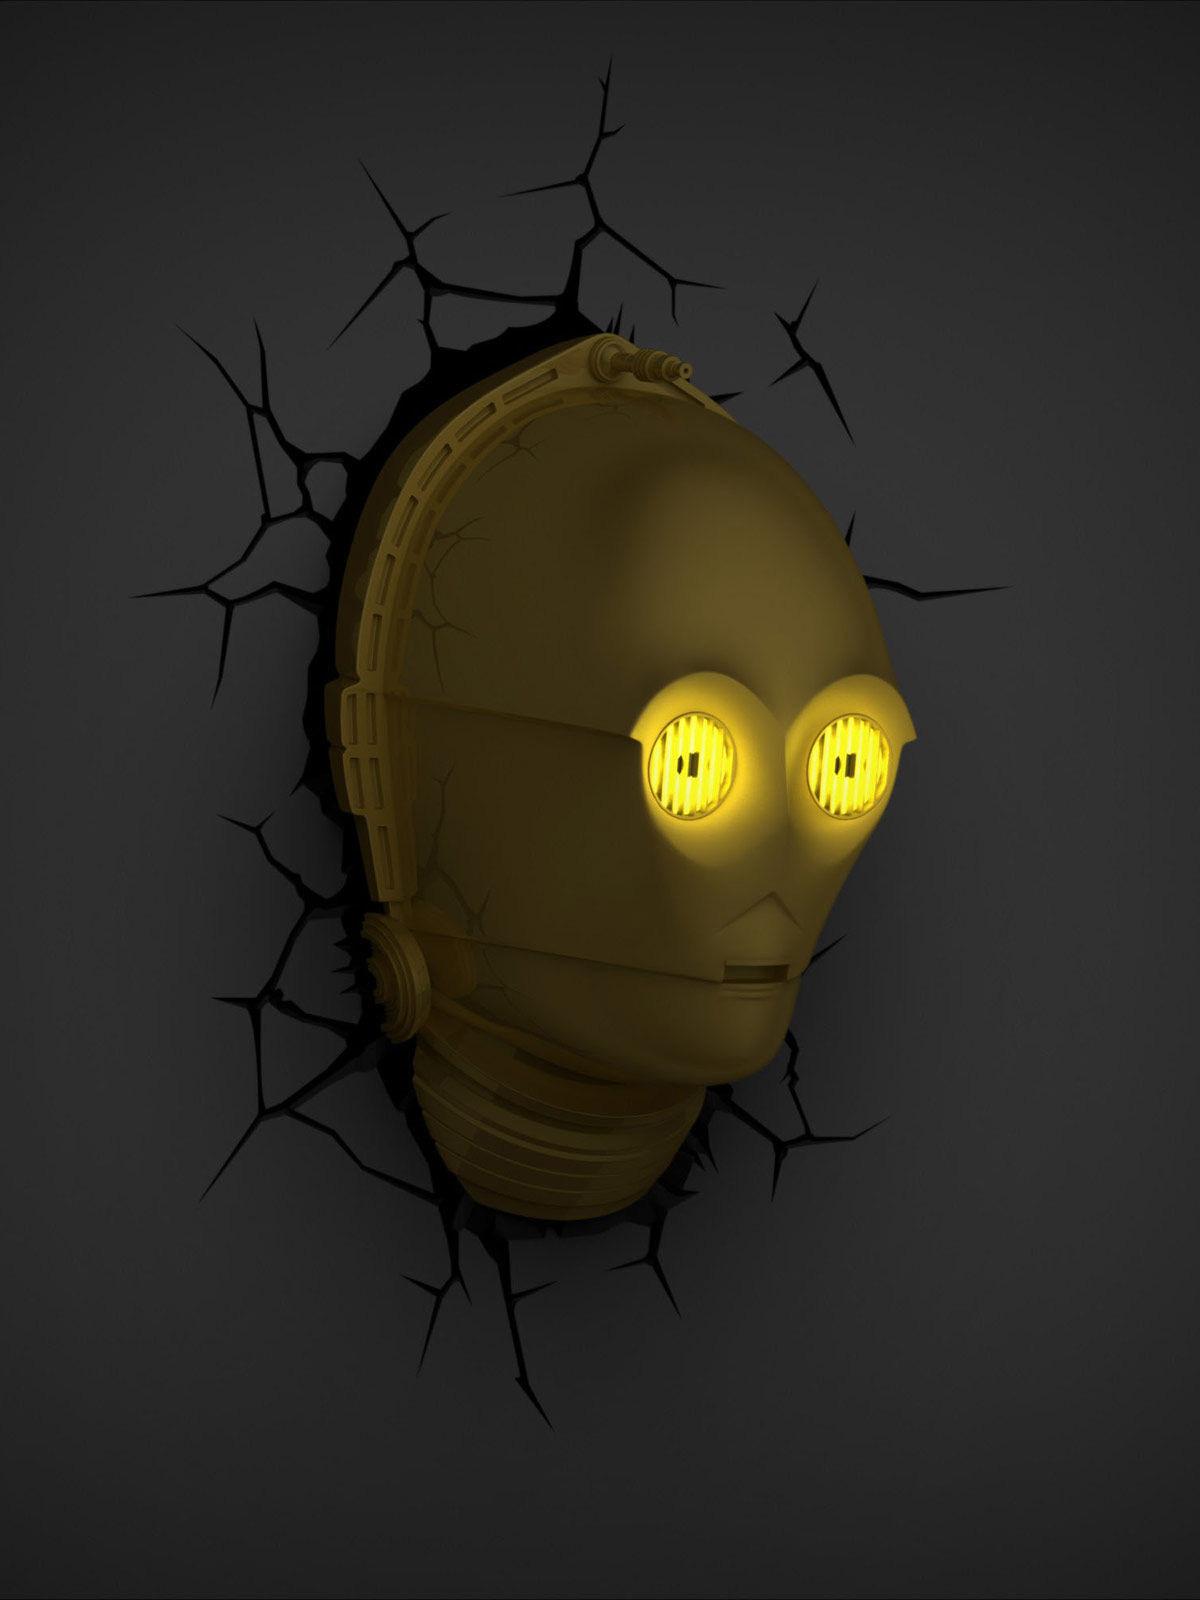 C-3PO-Wandlampe Star Wars Fanartikel gold 32,5x21x14cm